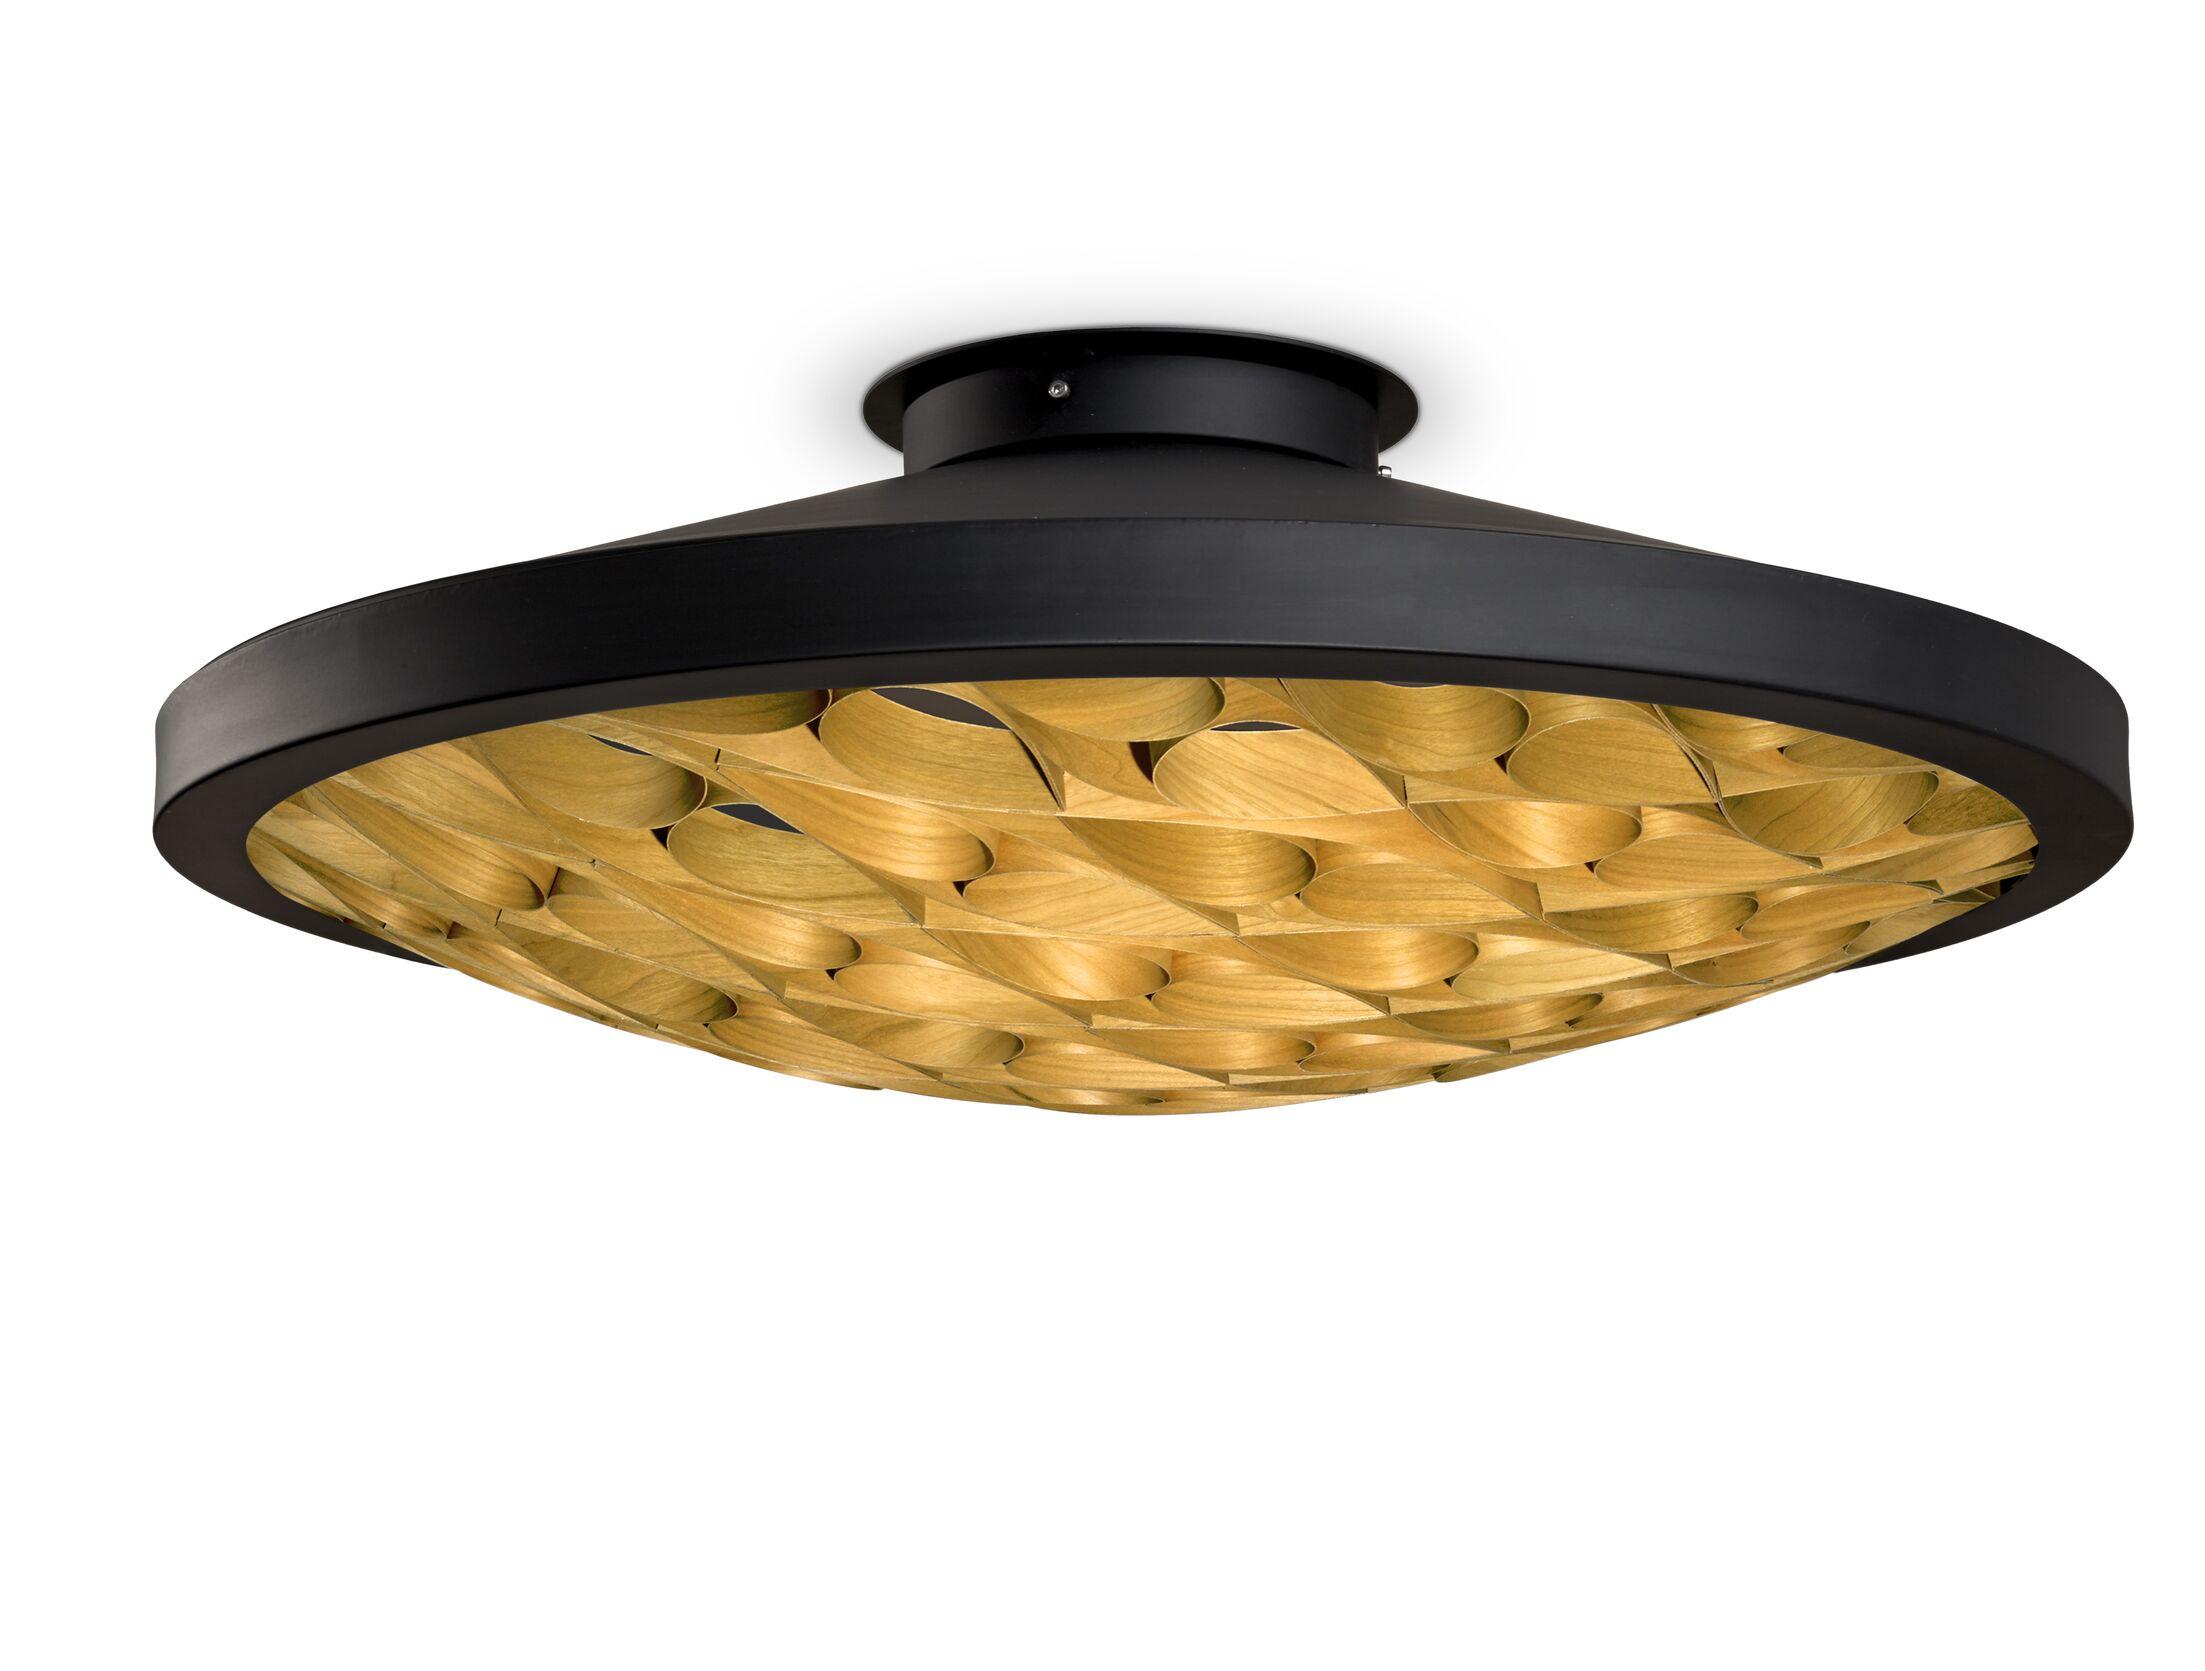 Cervantes LED Semi Flush Mount Finish: Matte Black, Shade Color: Natural Beech